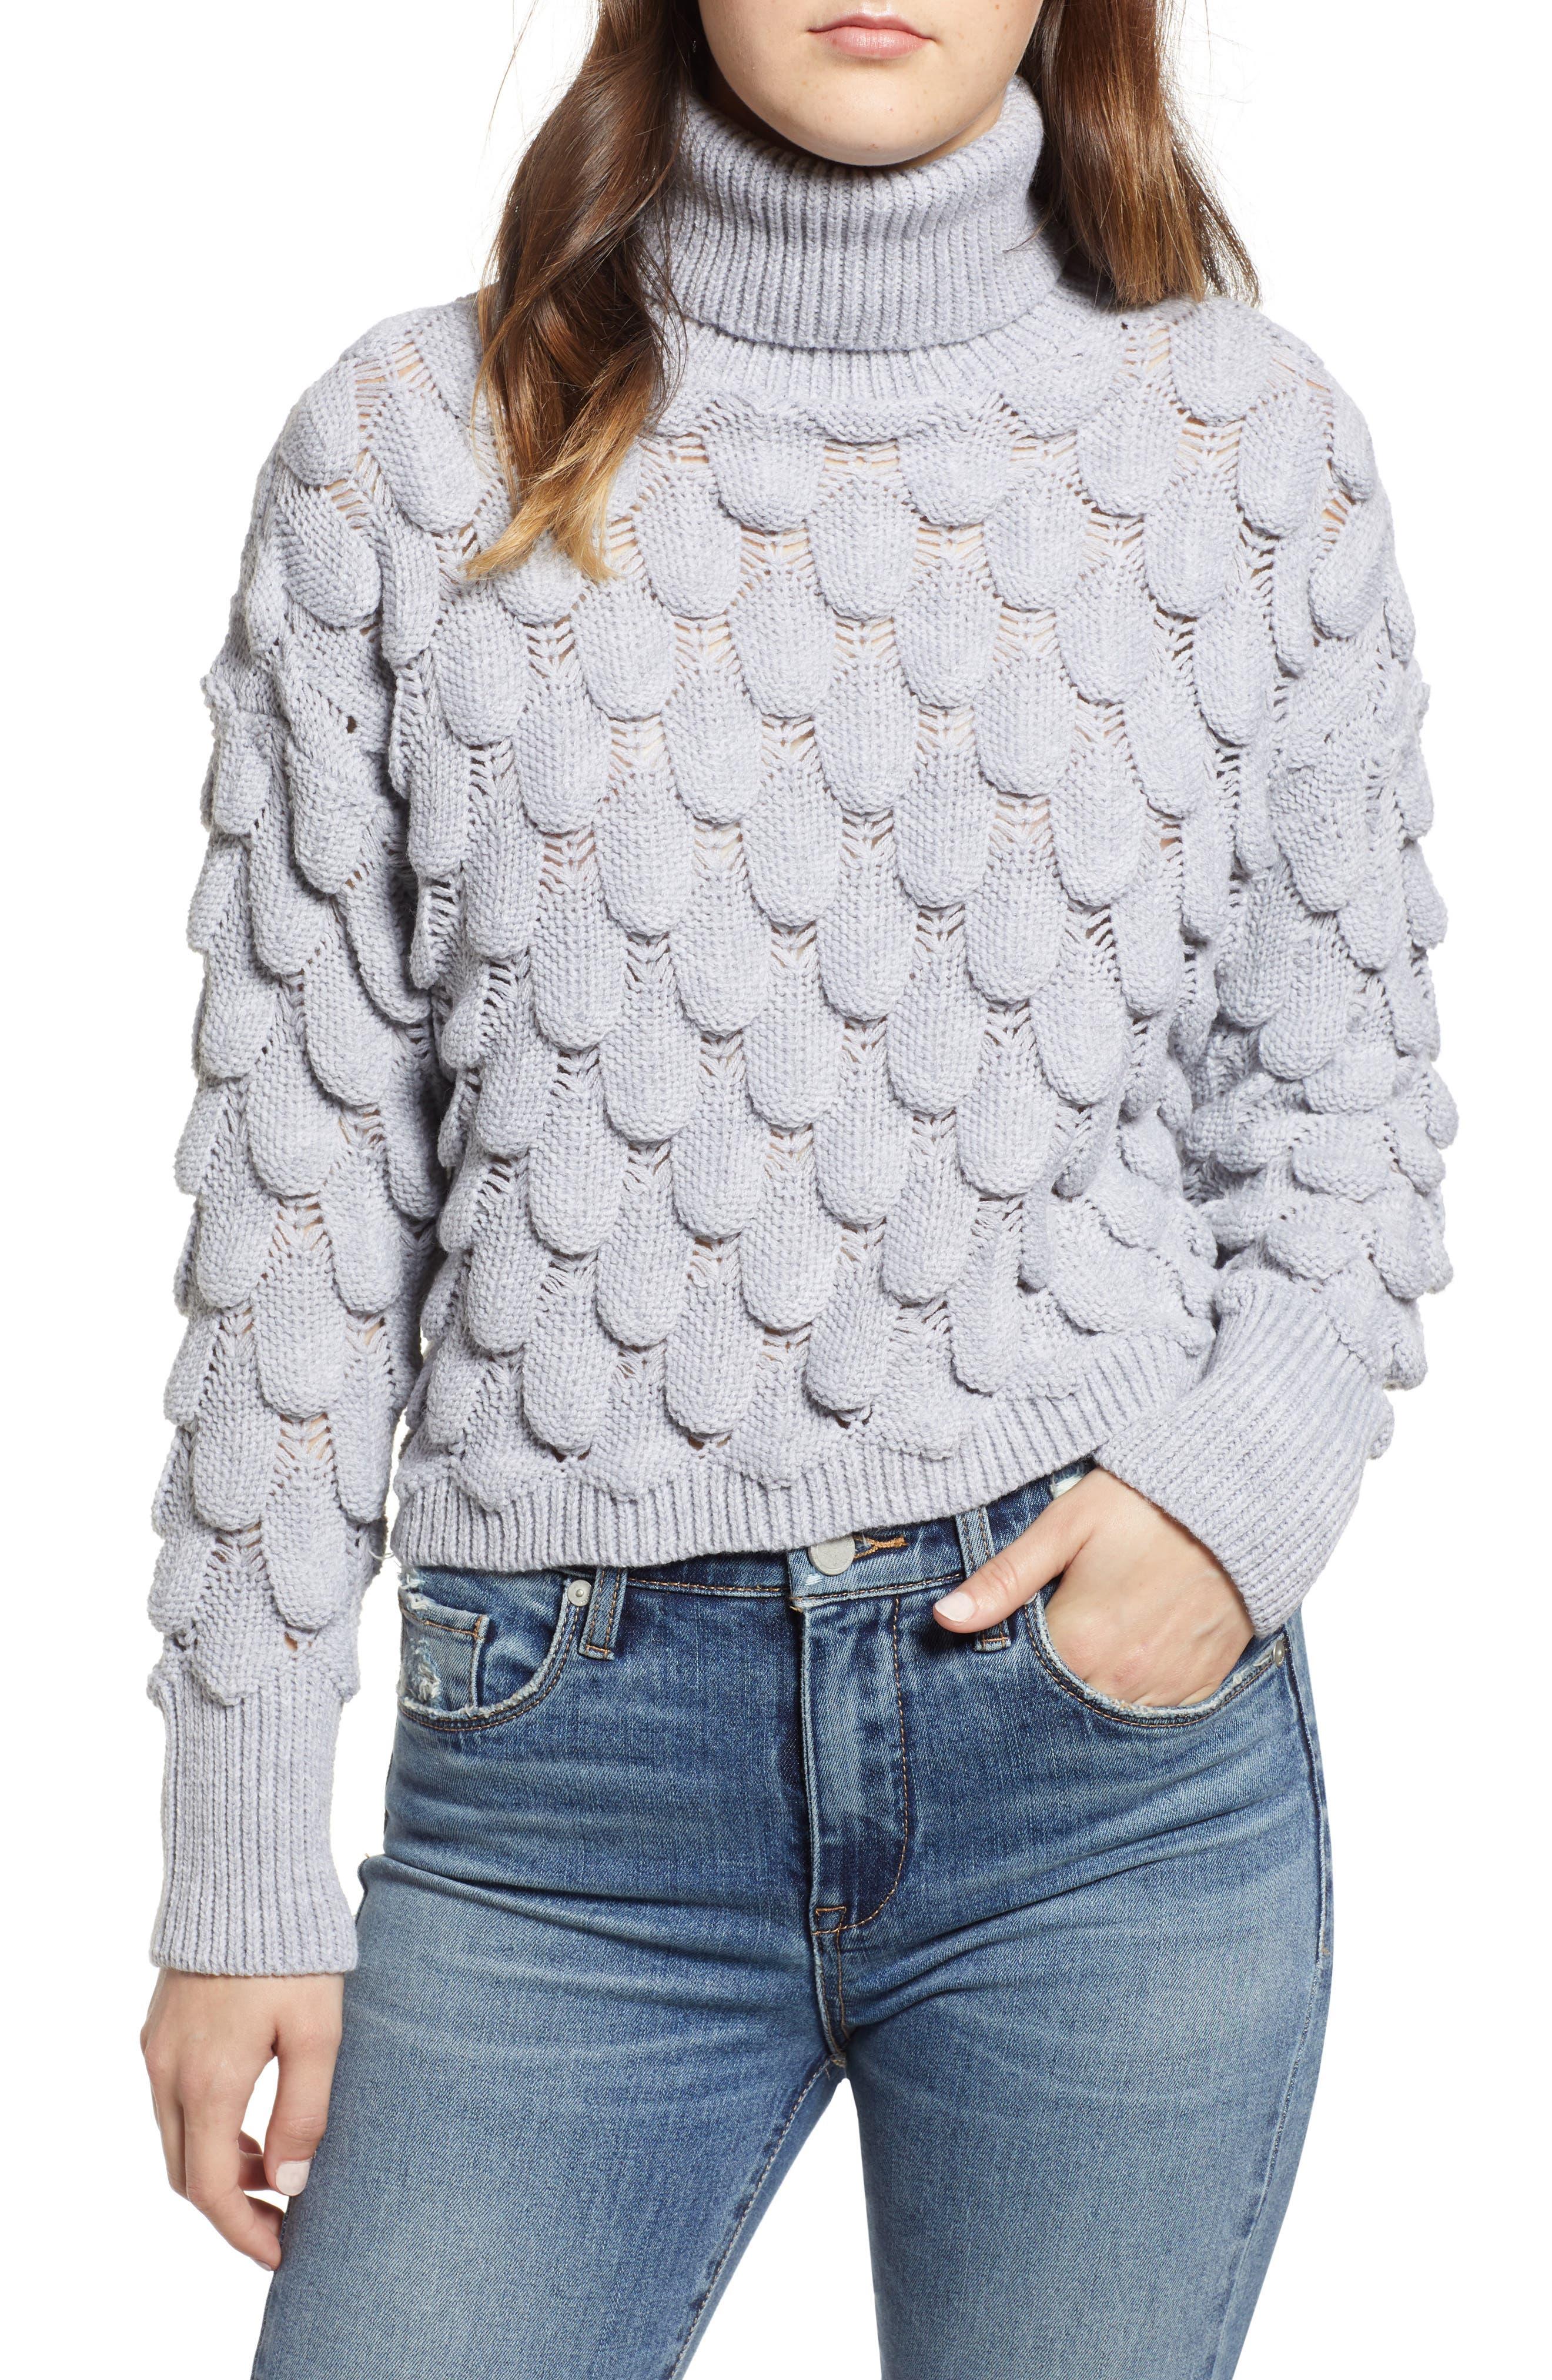 Scallop Stitch Sweater,                             Main thumbnail 1, color,                             038